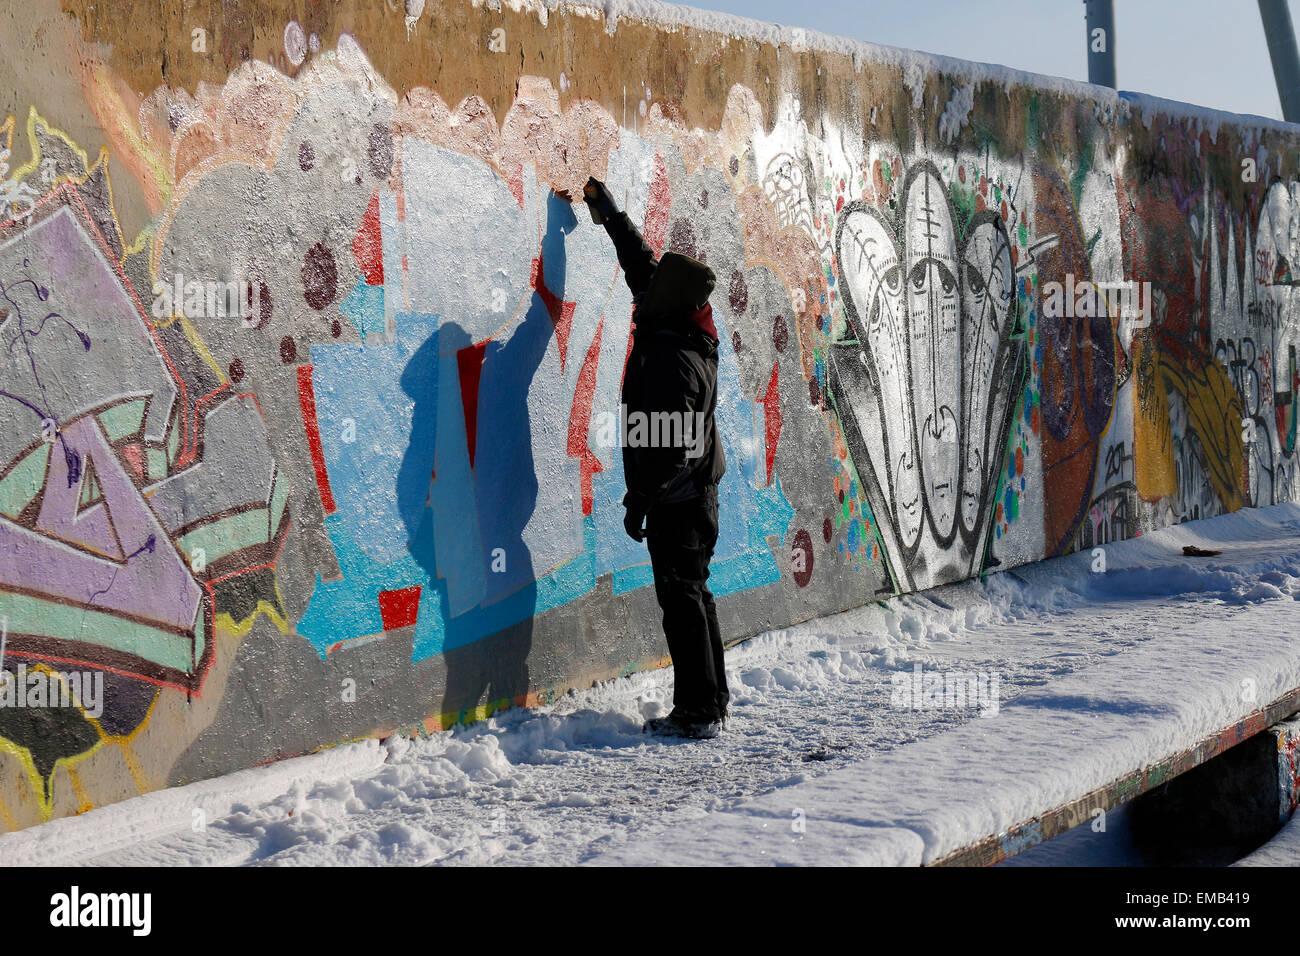 Graffity-Sprayer, Mauerpark,Berlin-Prenzlauer Berg. - Stock Image